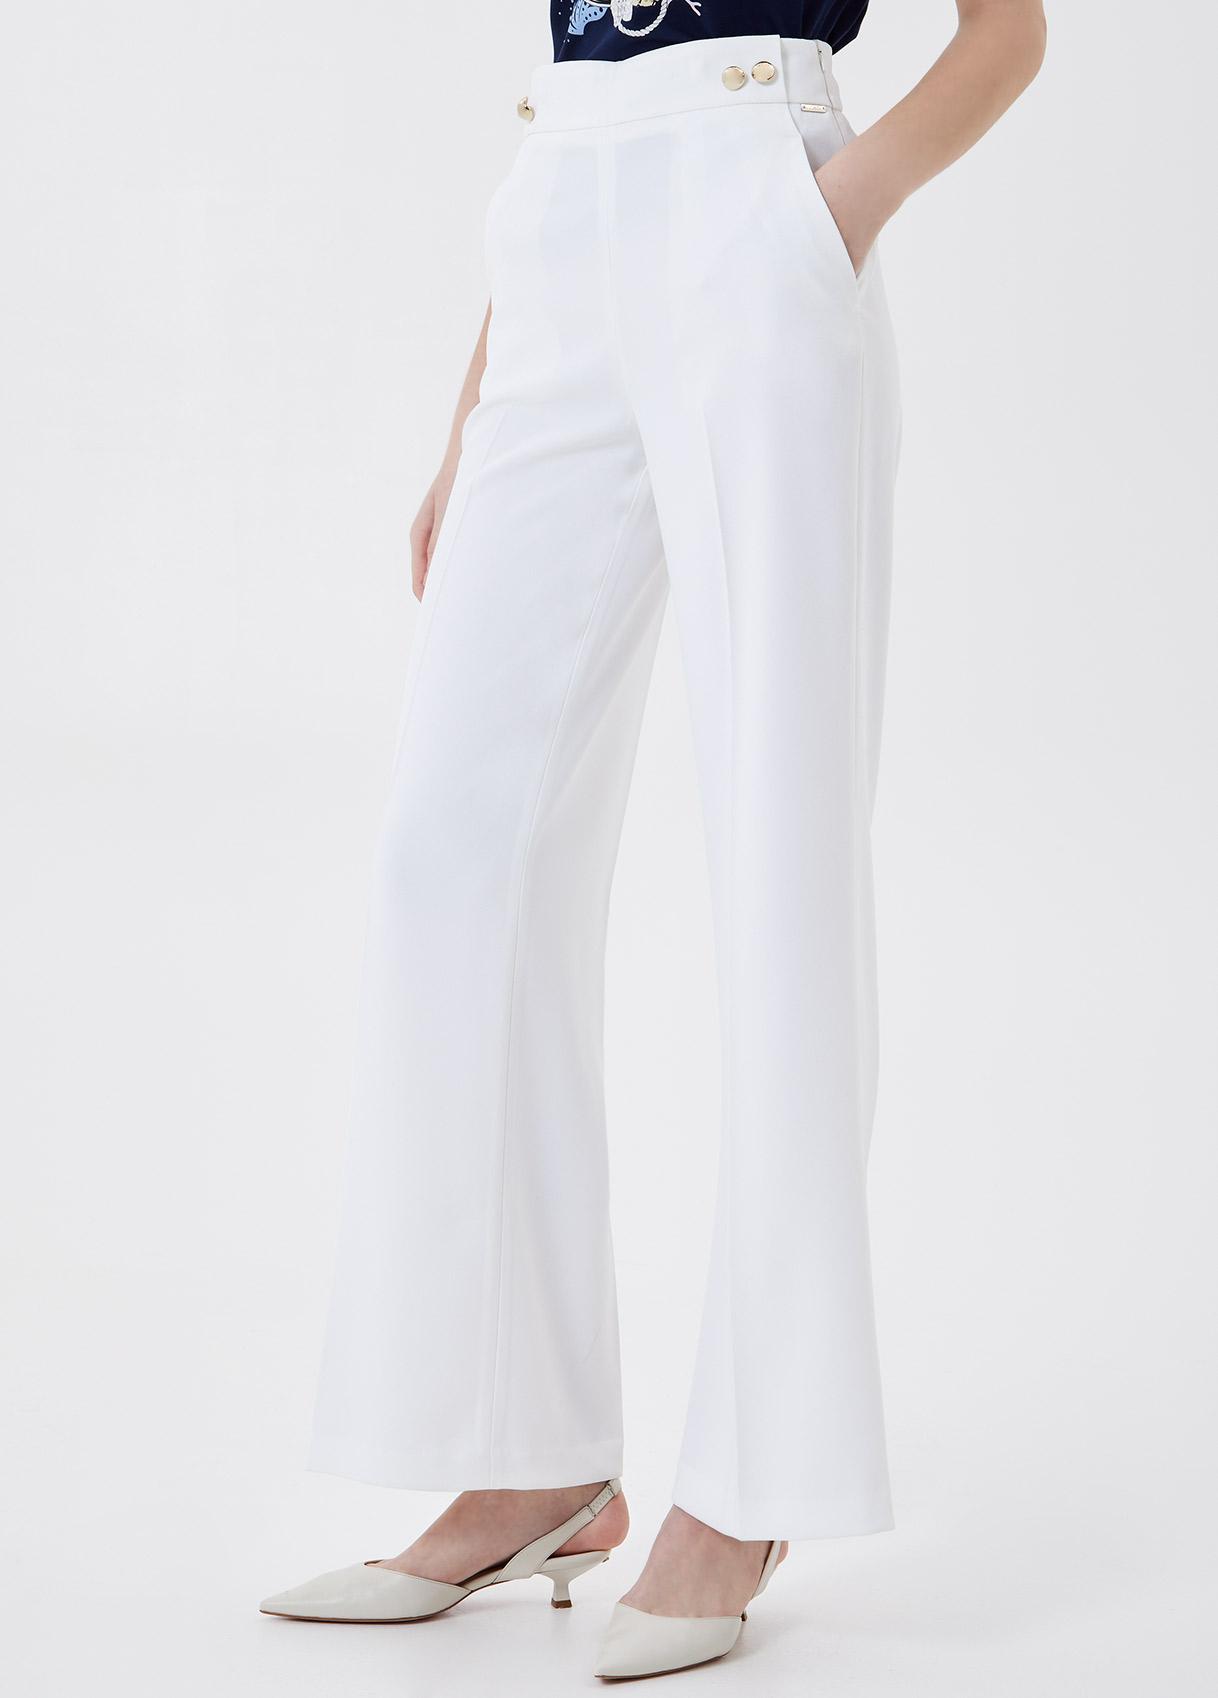 LIU JO | Trousers | WA1193T478610701